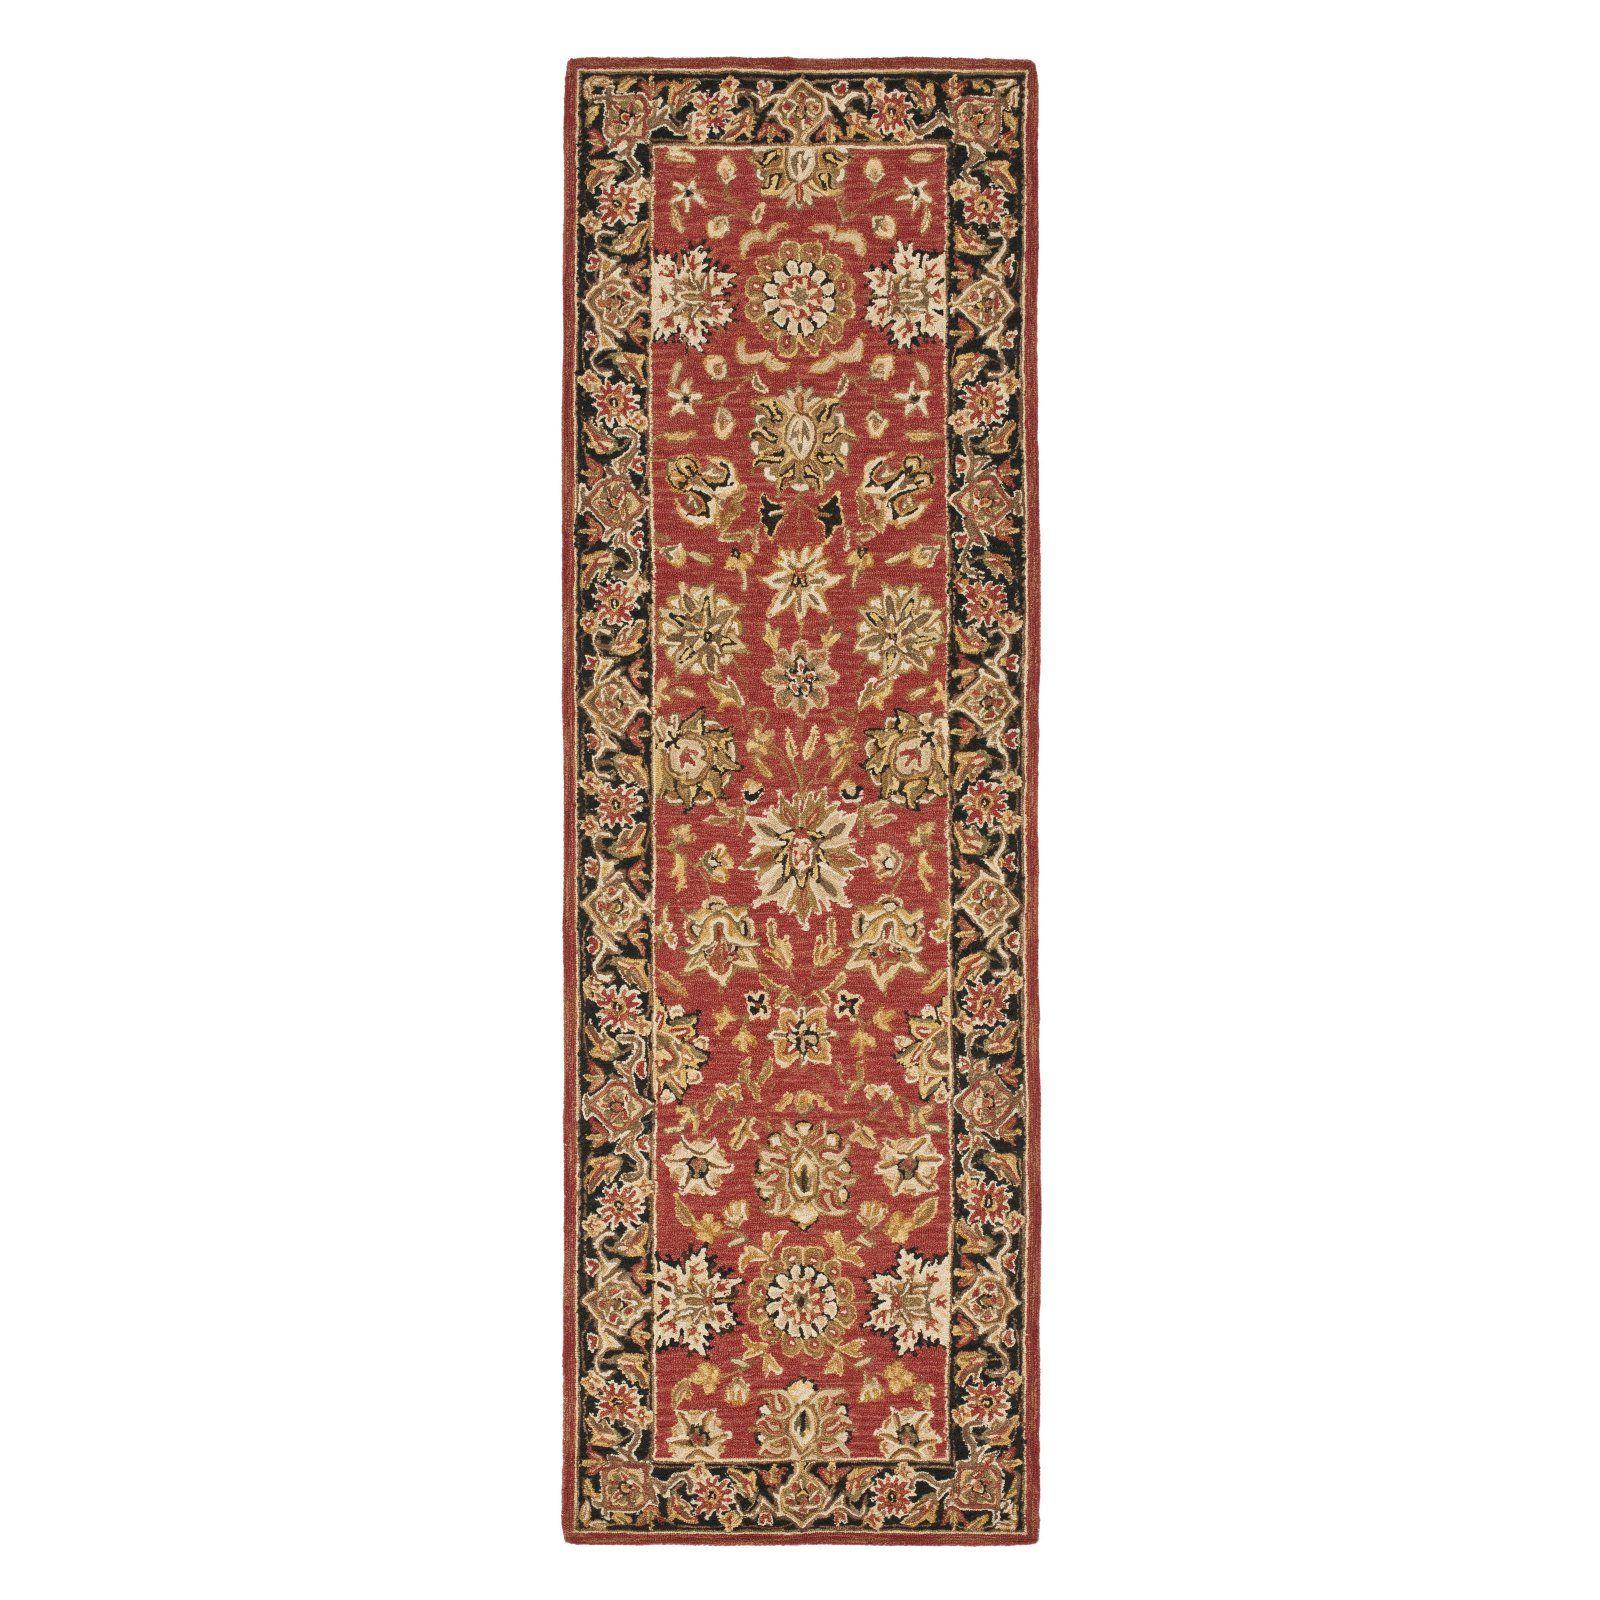 Safavieh Chelsea HK505C Area Rug Rose/Black Red carpet